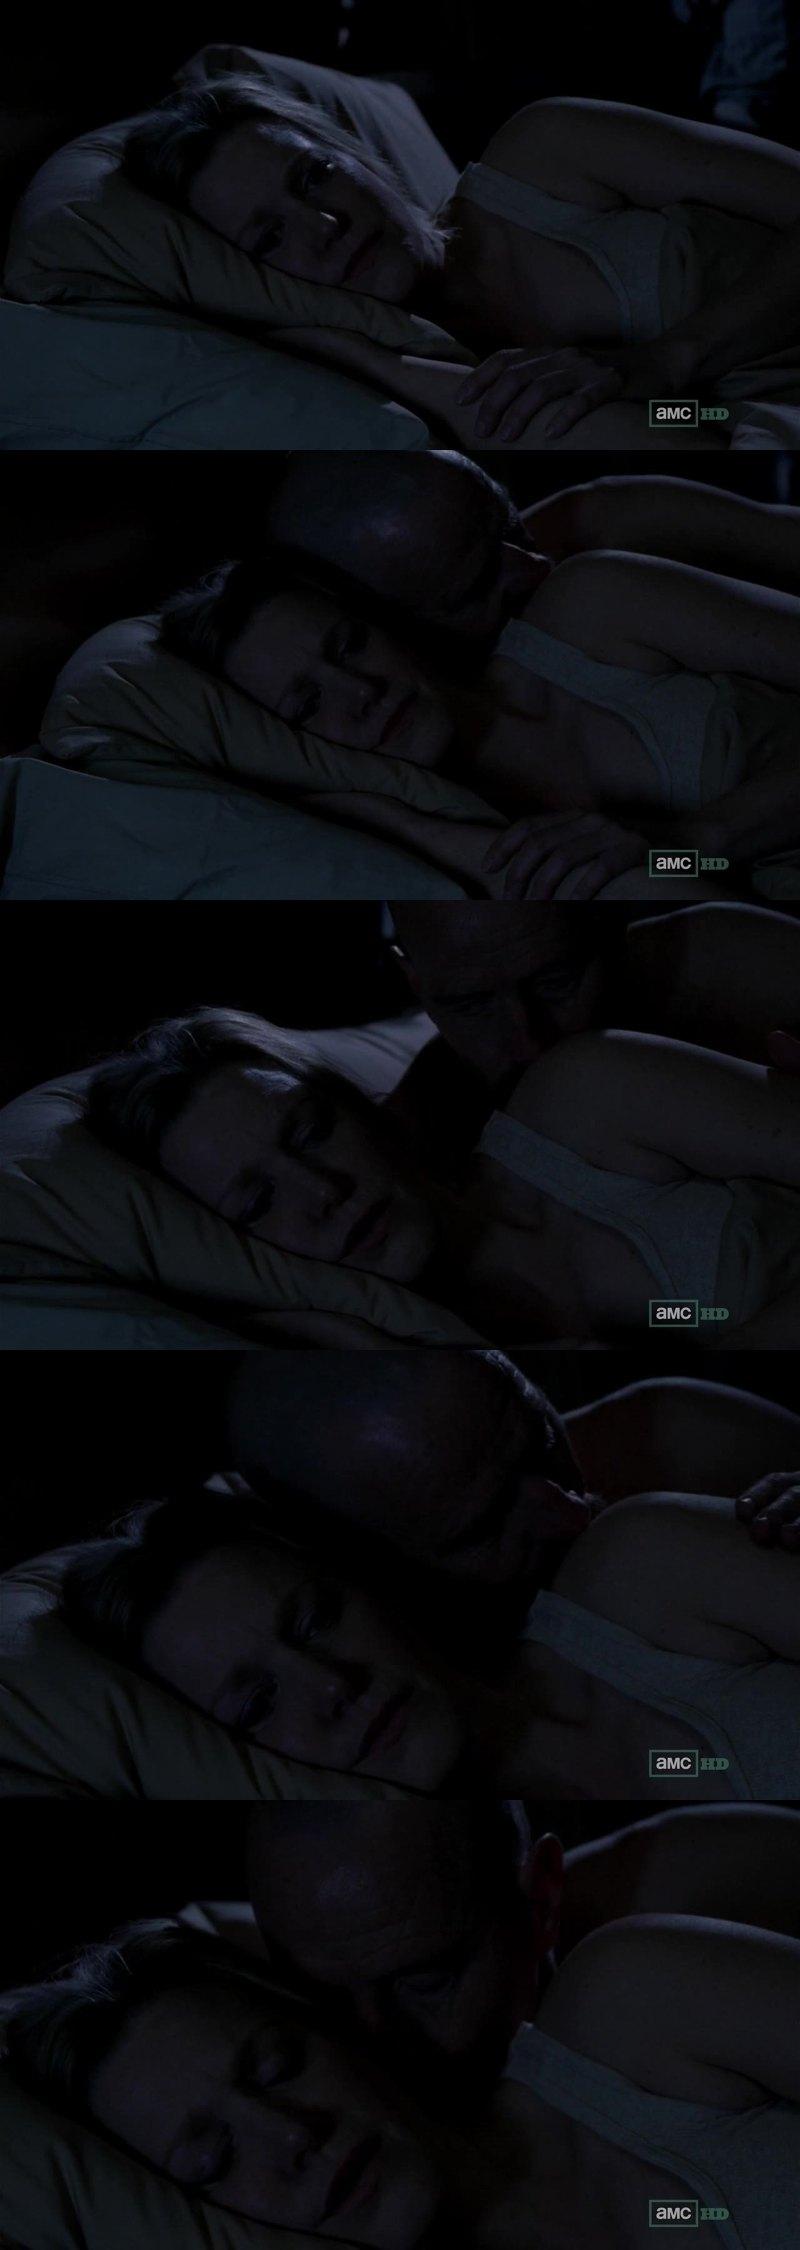 Skyler is afraid of Walt. That last scene was weird.